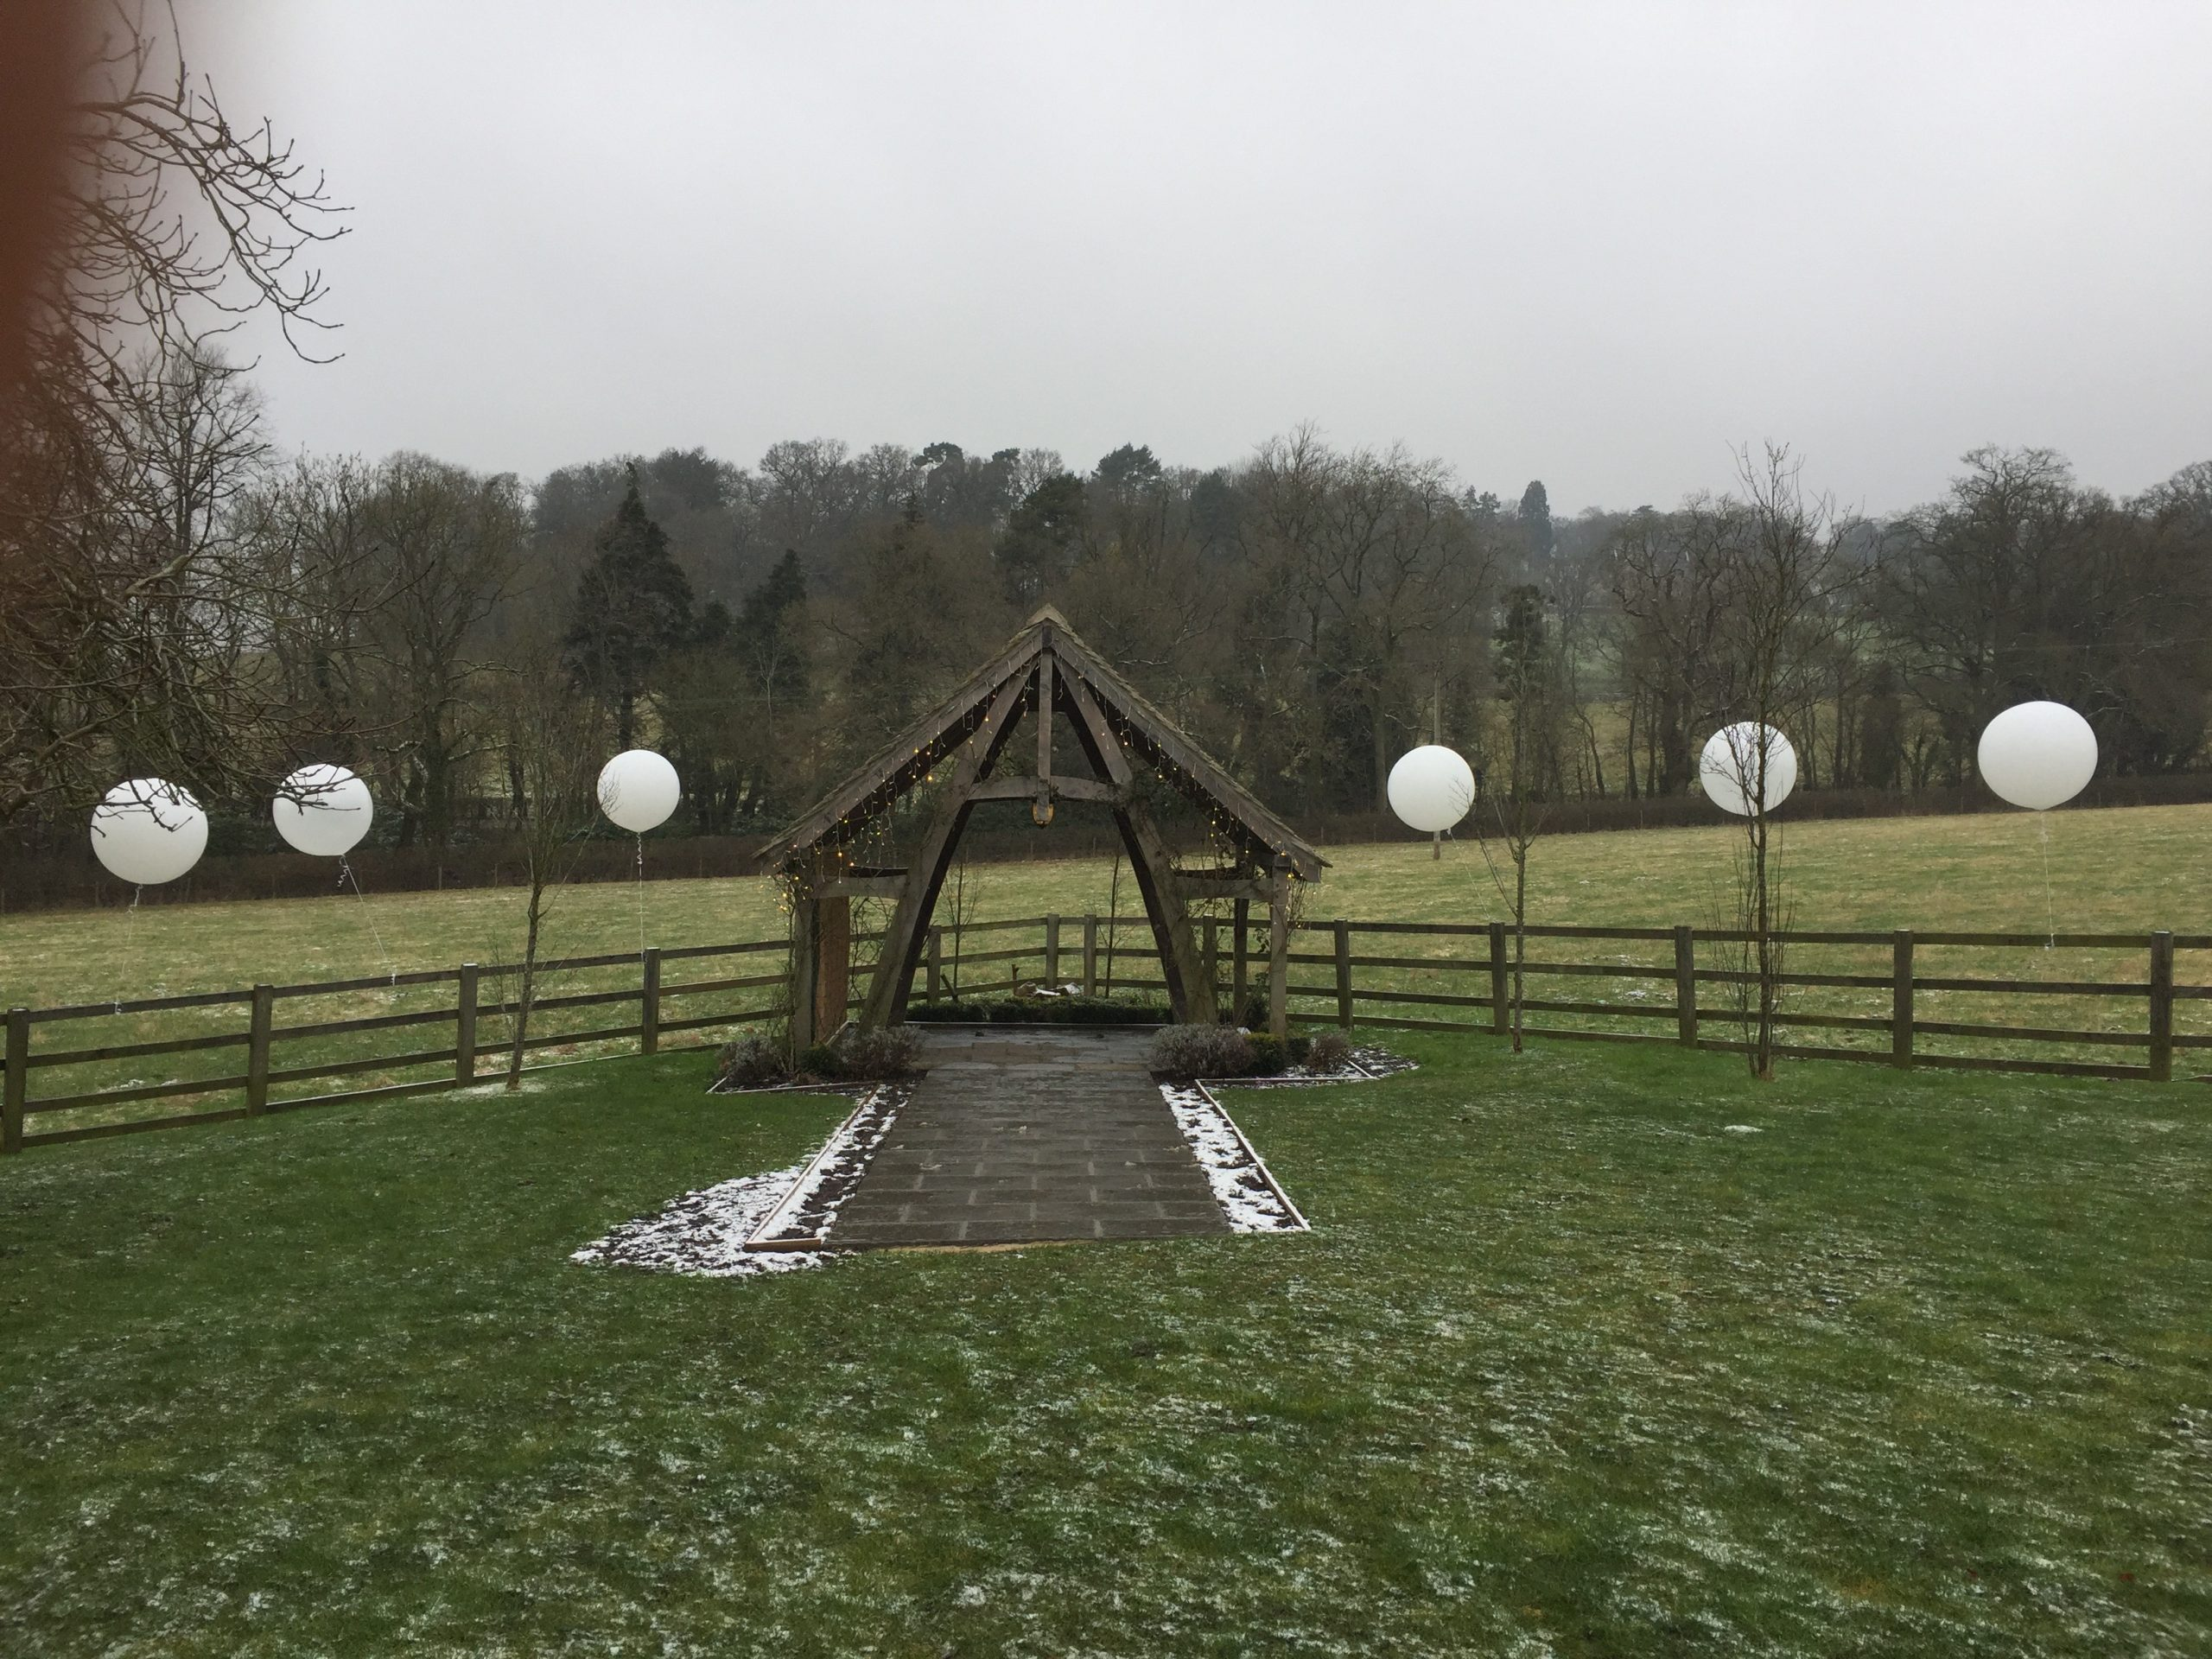 3ft Balloons along a fence